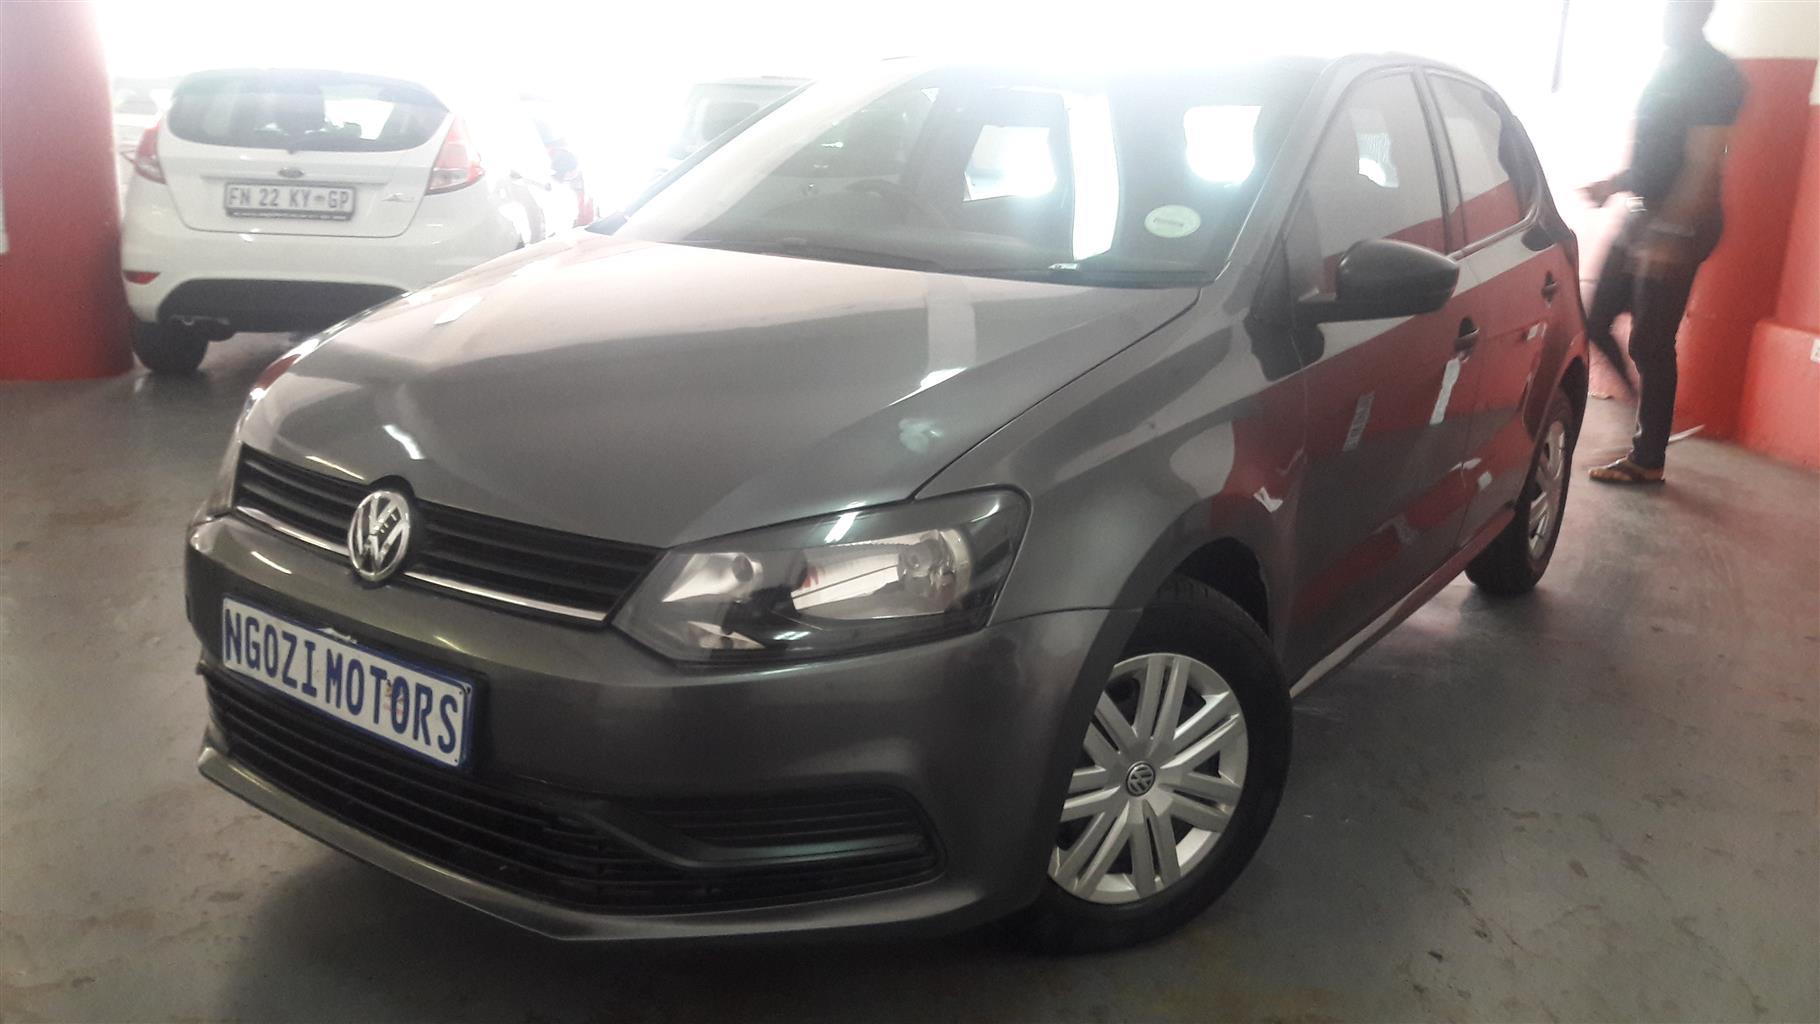 Polo For Sale In Gauteng R30000 | AGBU Hye Geen